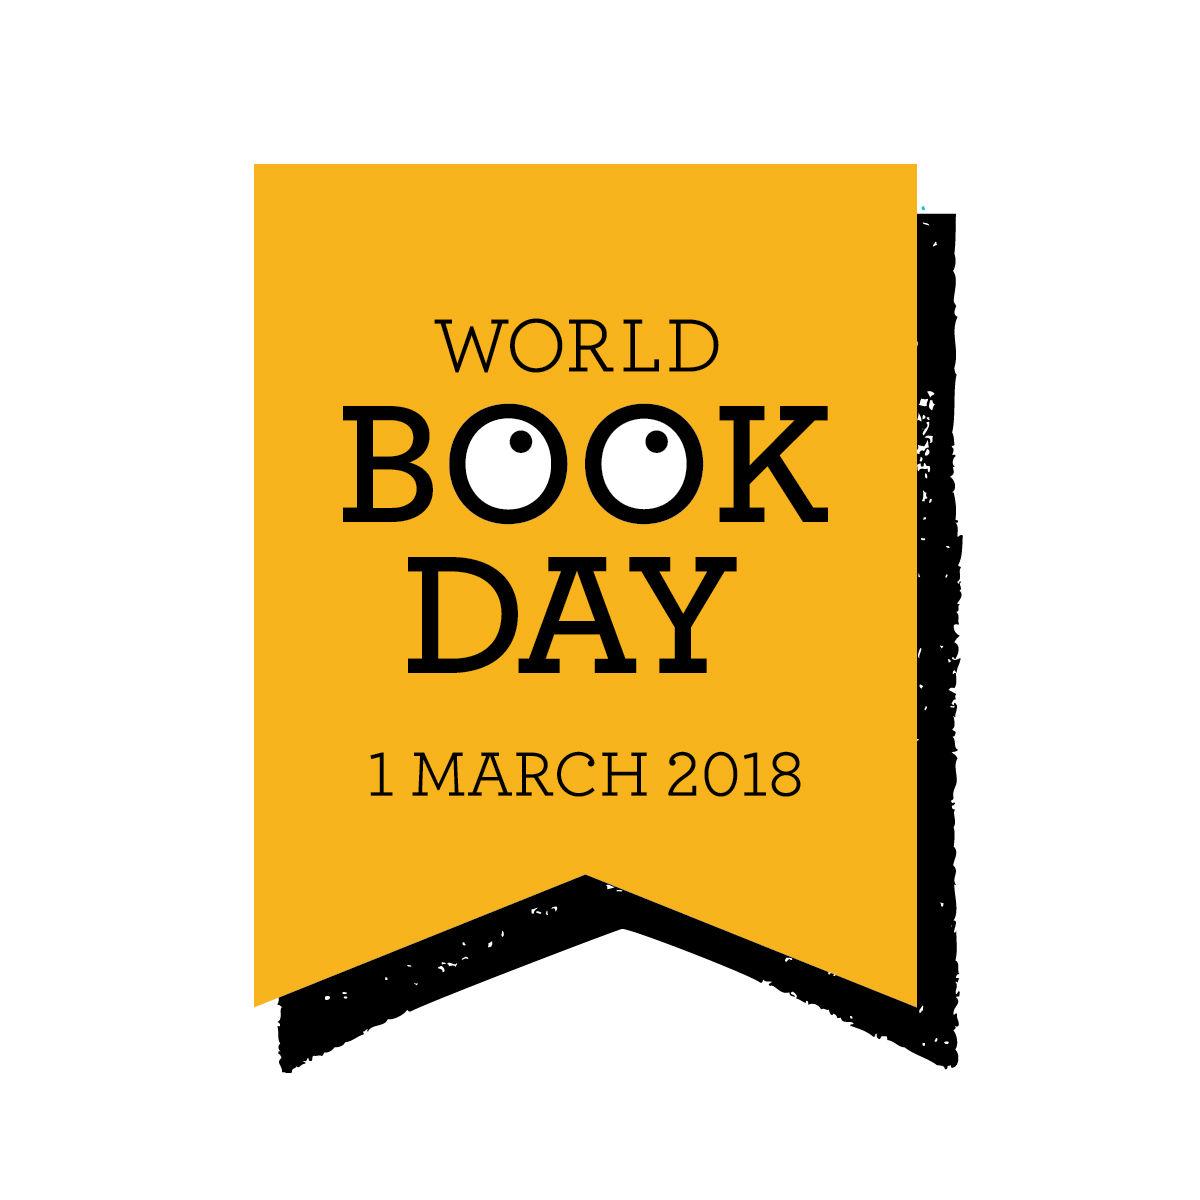 Easy Blyton costume ideas for World Book Day